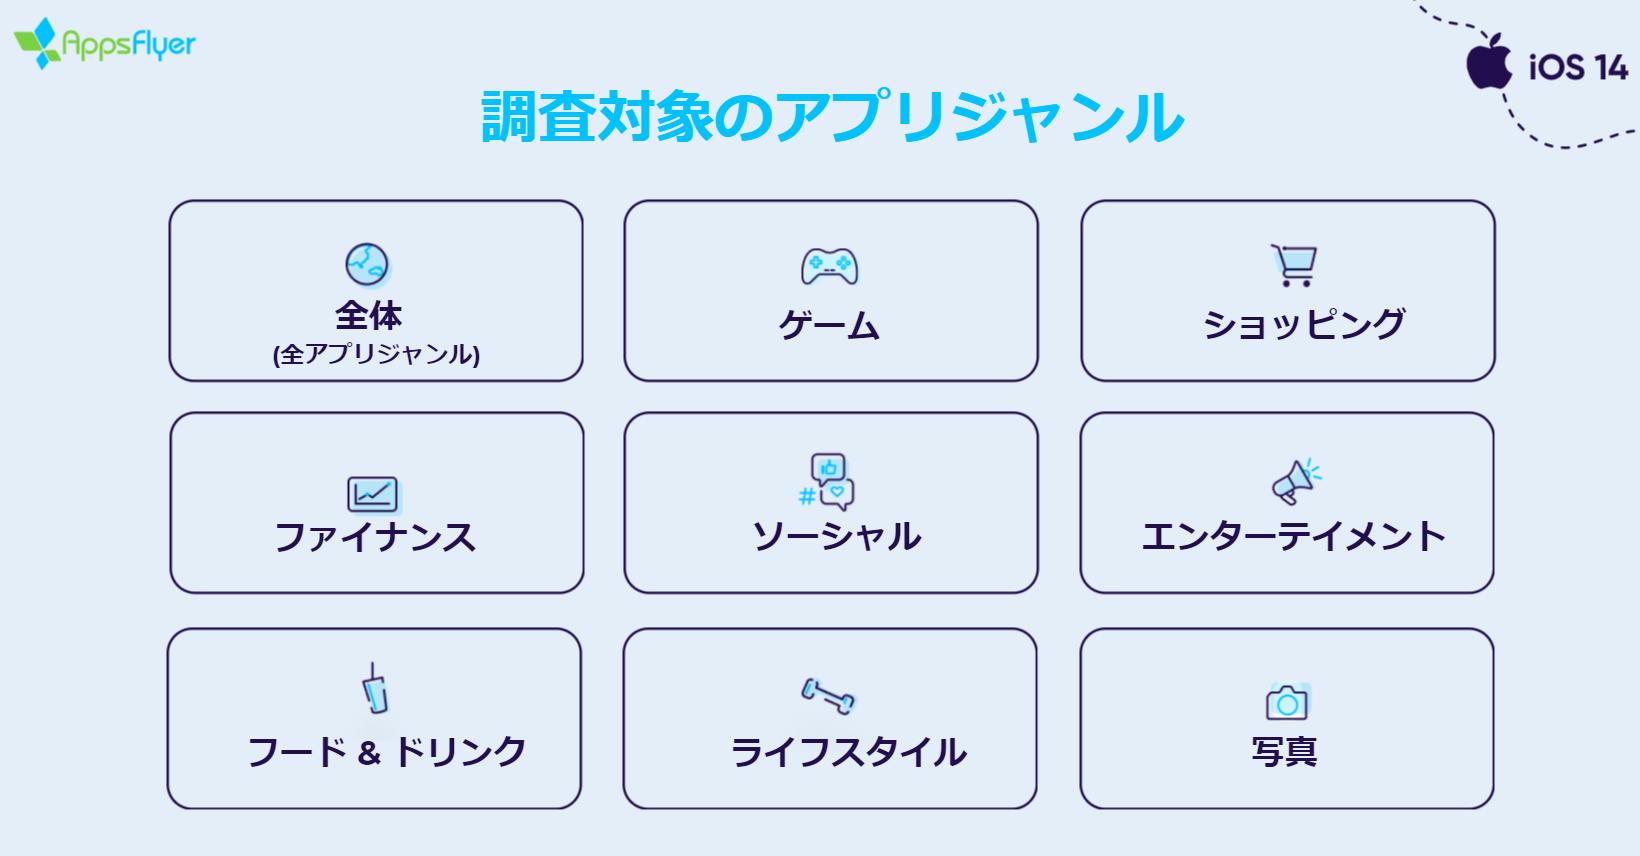 AppsFlyerATTreport202105_genre